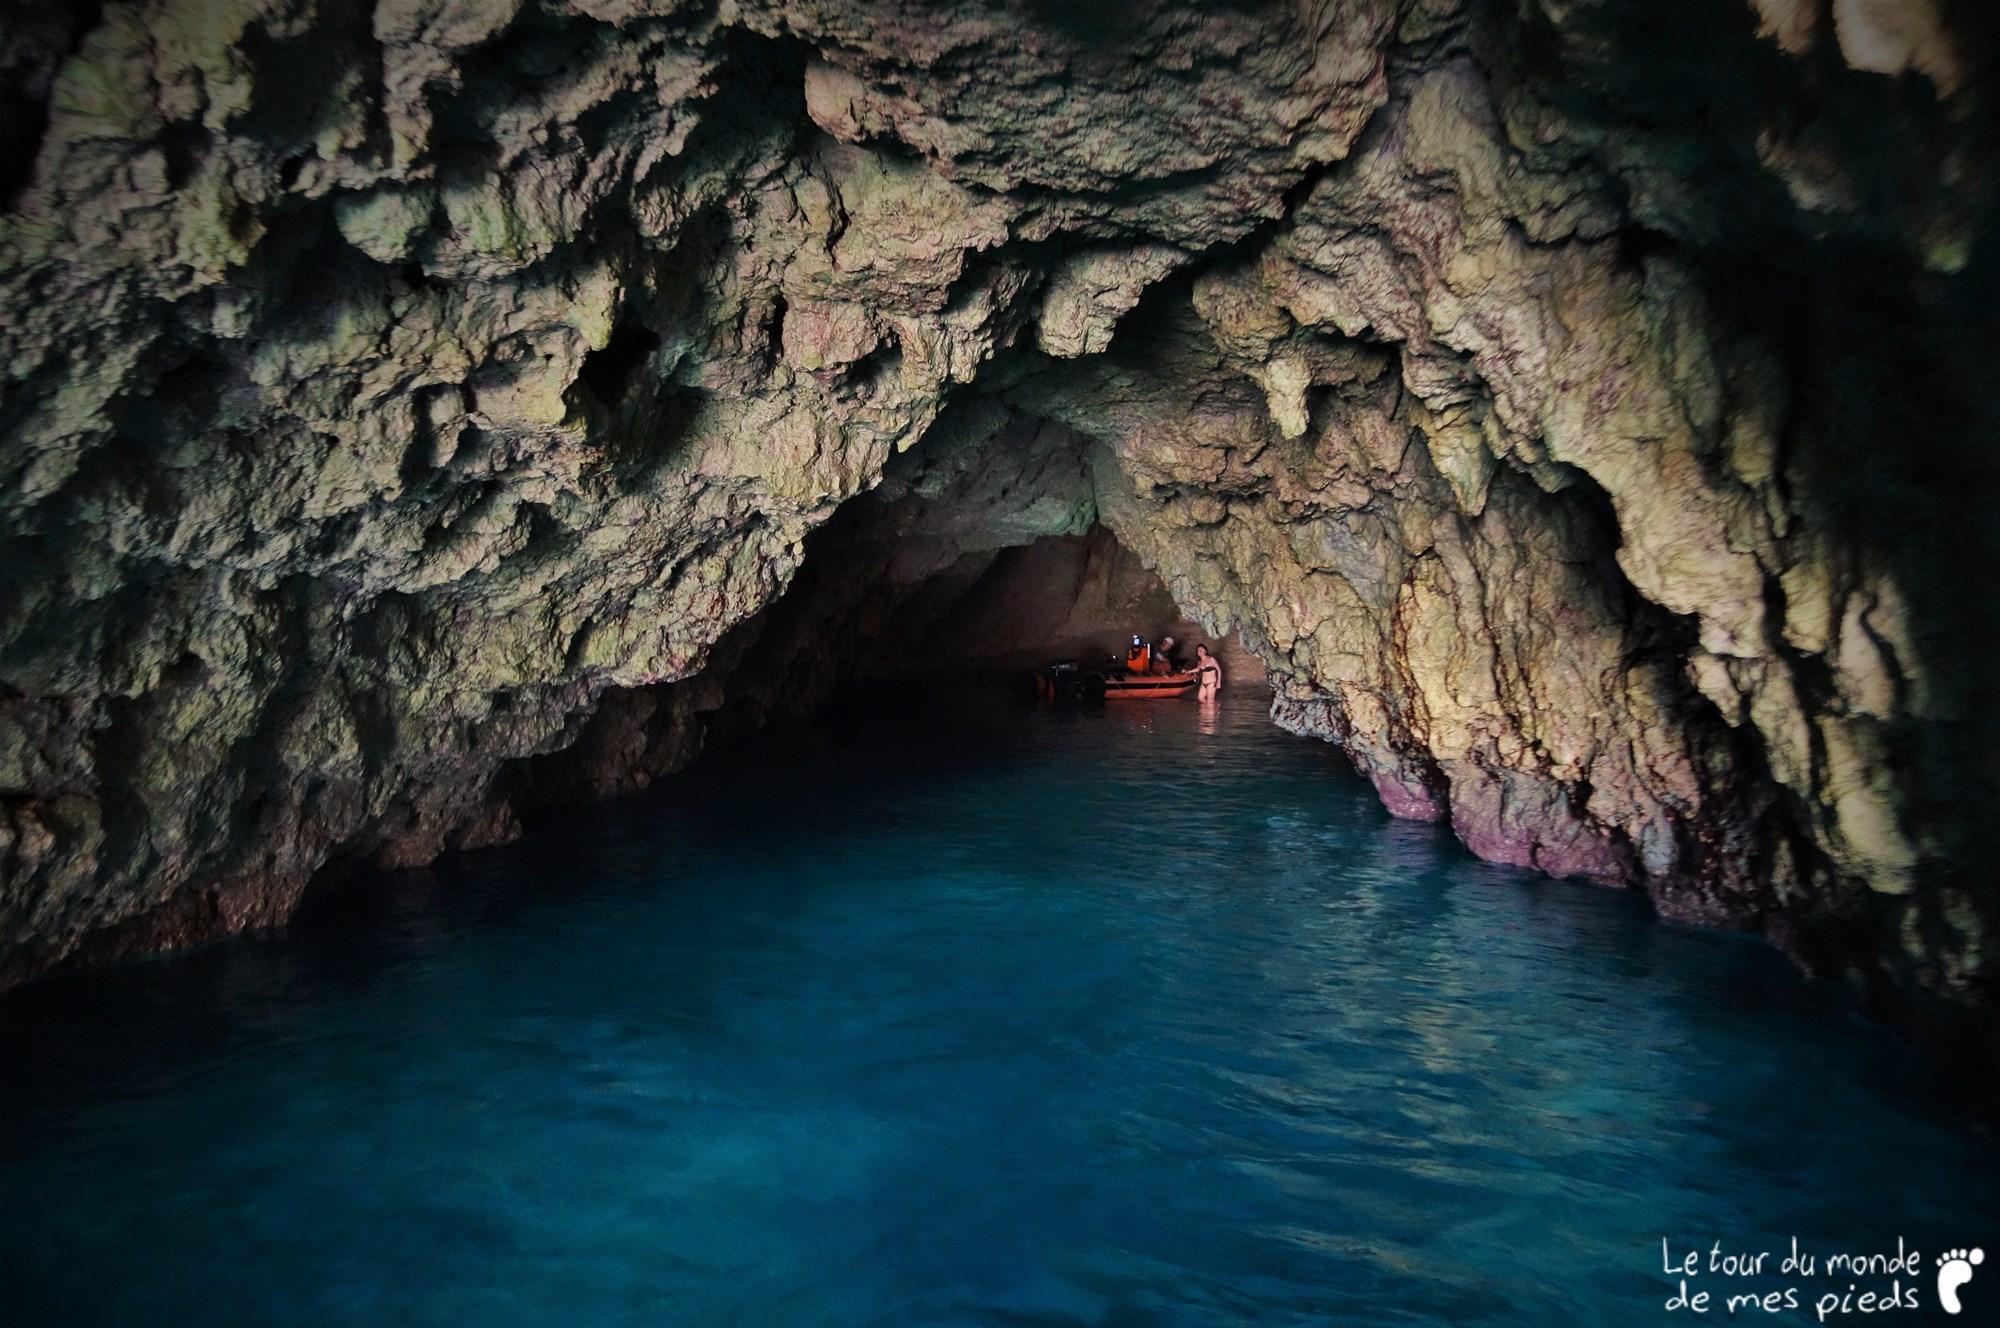 comino-grotte-interieur_GF